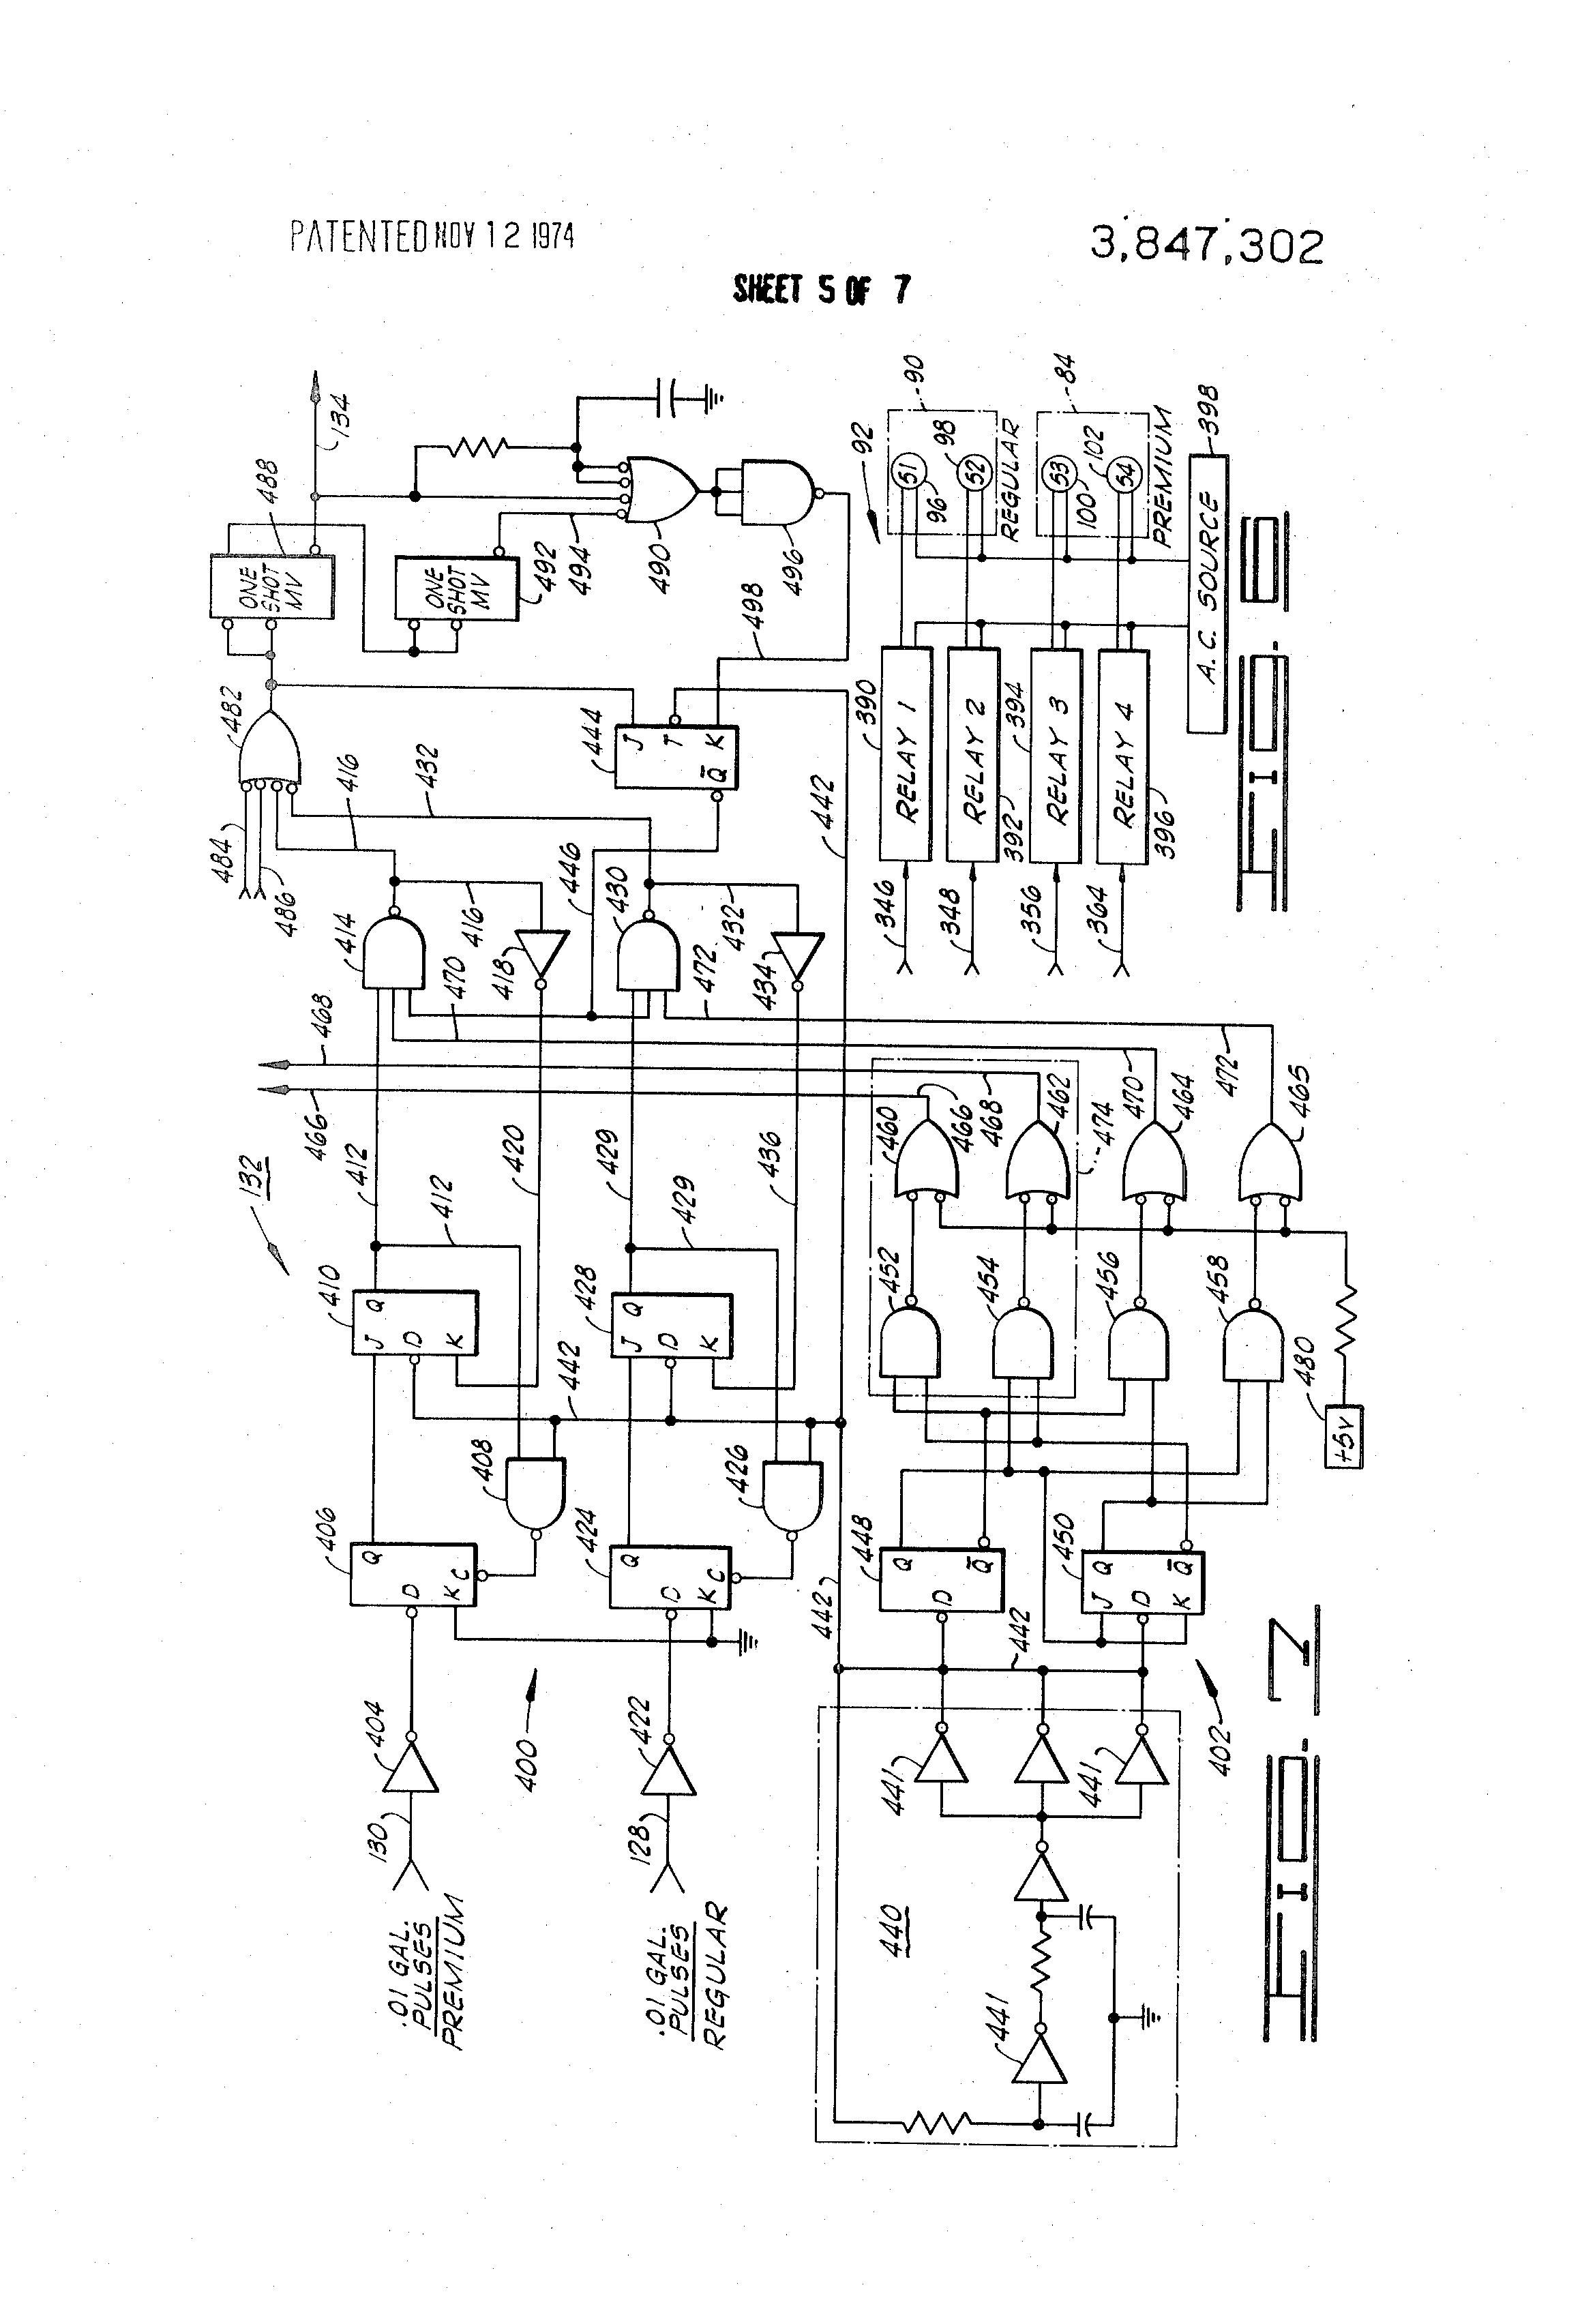 gasboy fuel pump wiring diagram motor fuel dispensing facilities sewer pump wiring diagram  gas station pump wiring diagram